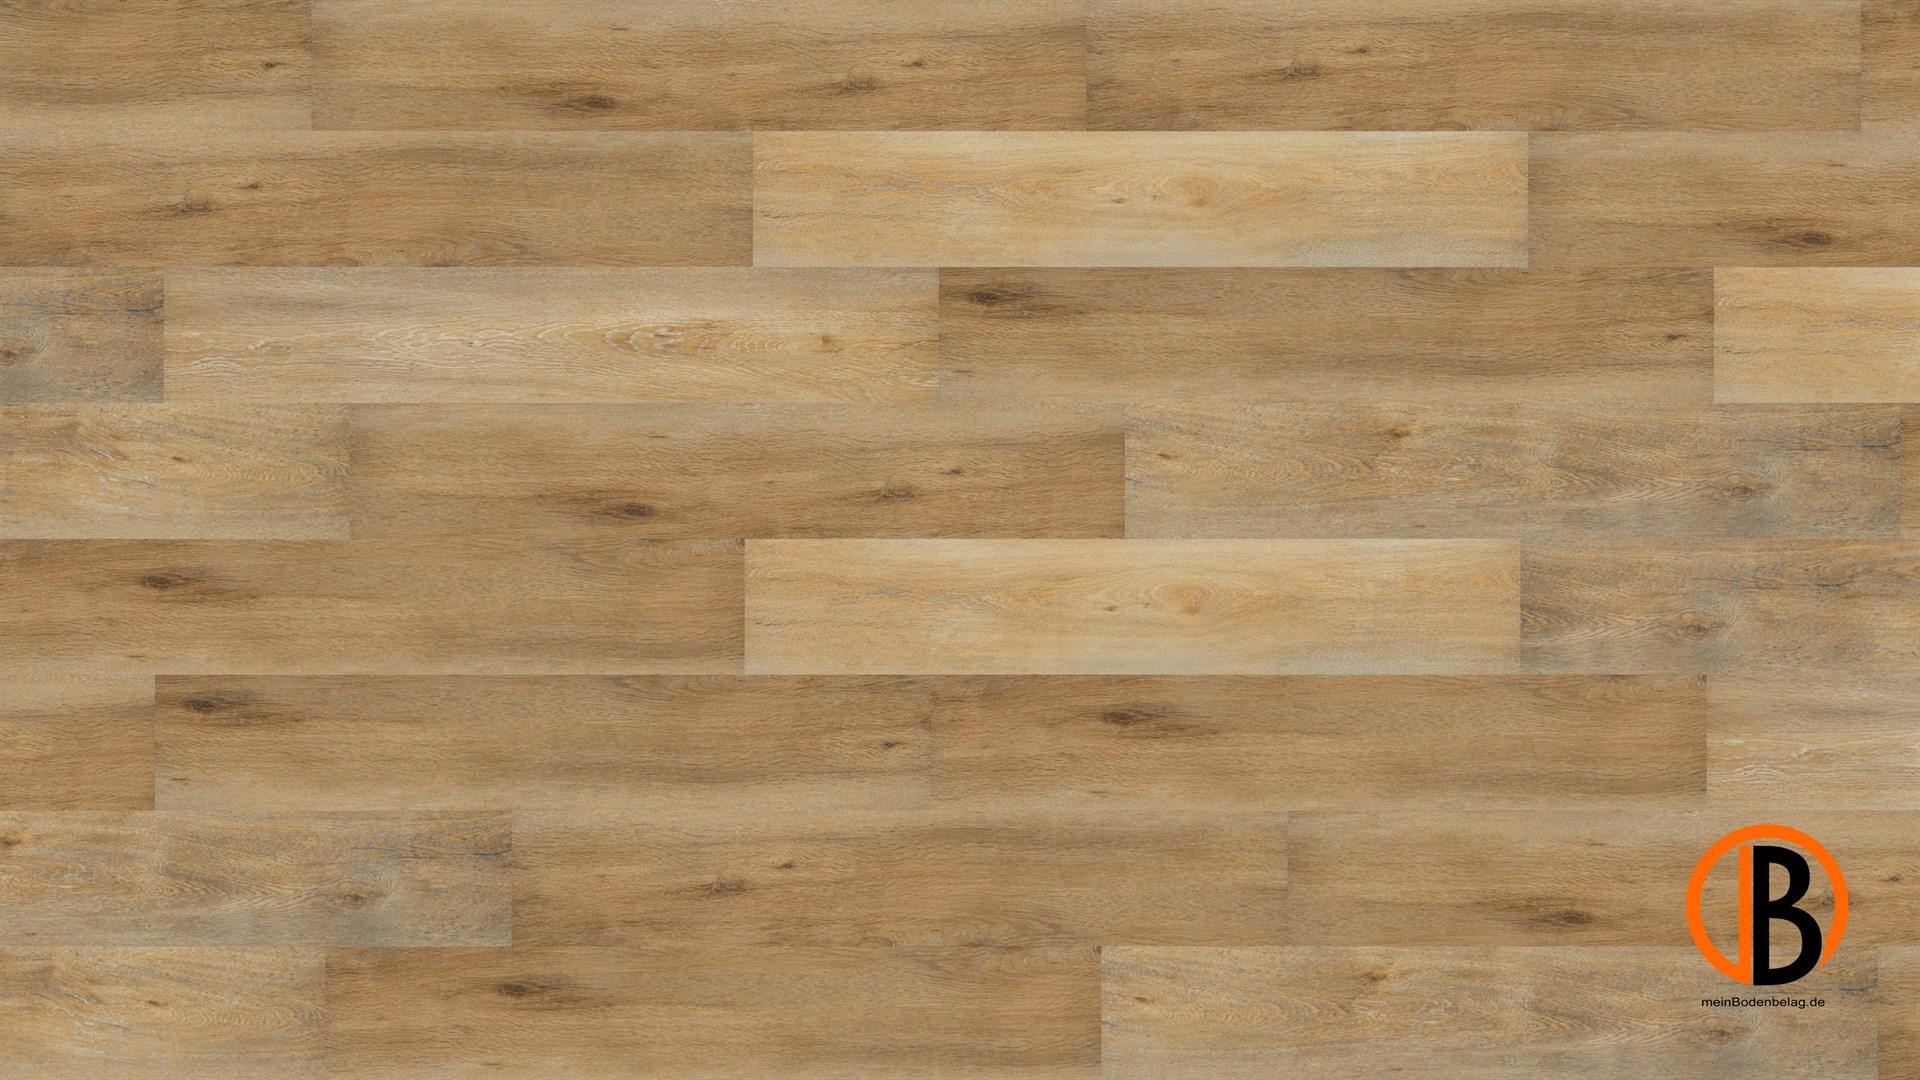 CINQUE KWG DESIGNERVINYL ANTIGUA INFINITY SHEETS | 10000276;0 | Bild 1